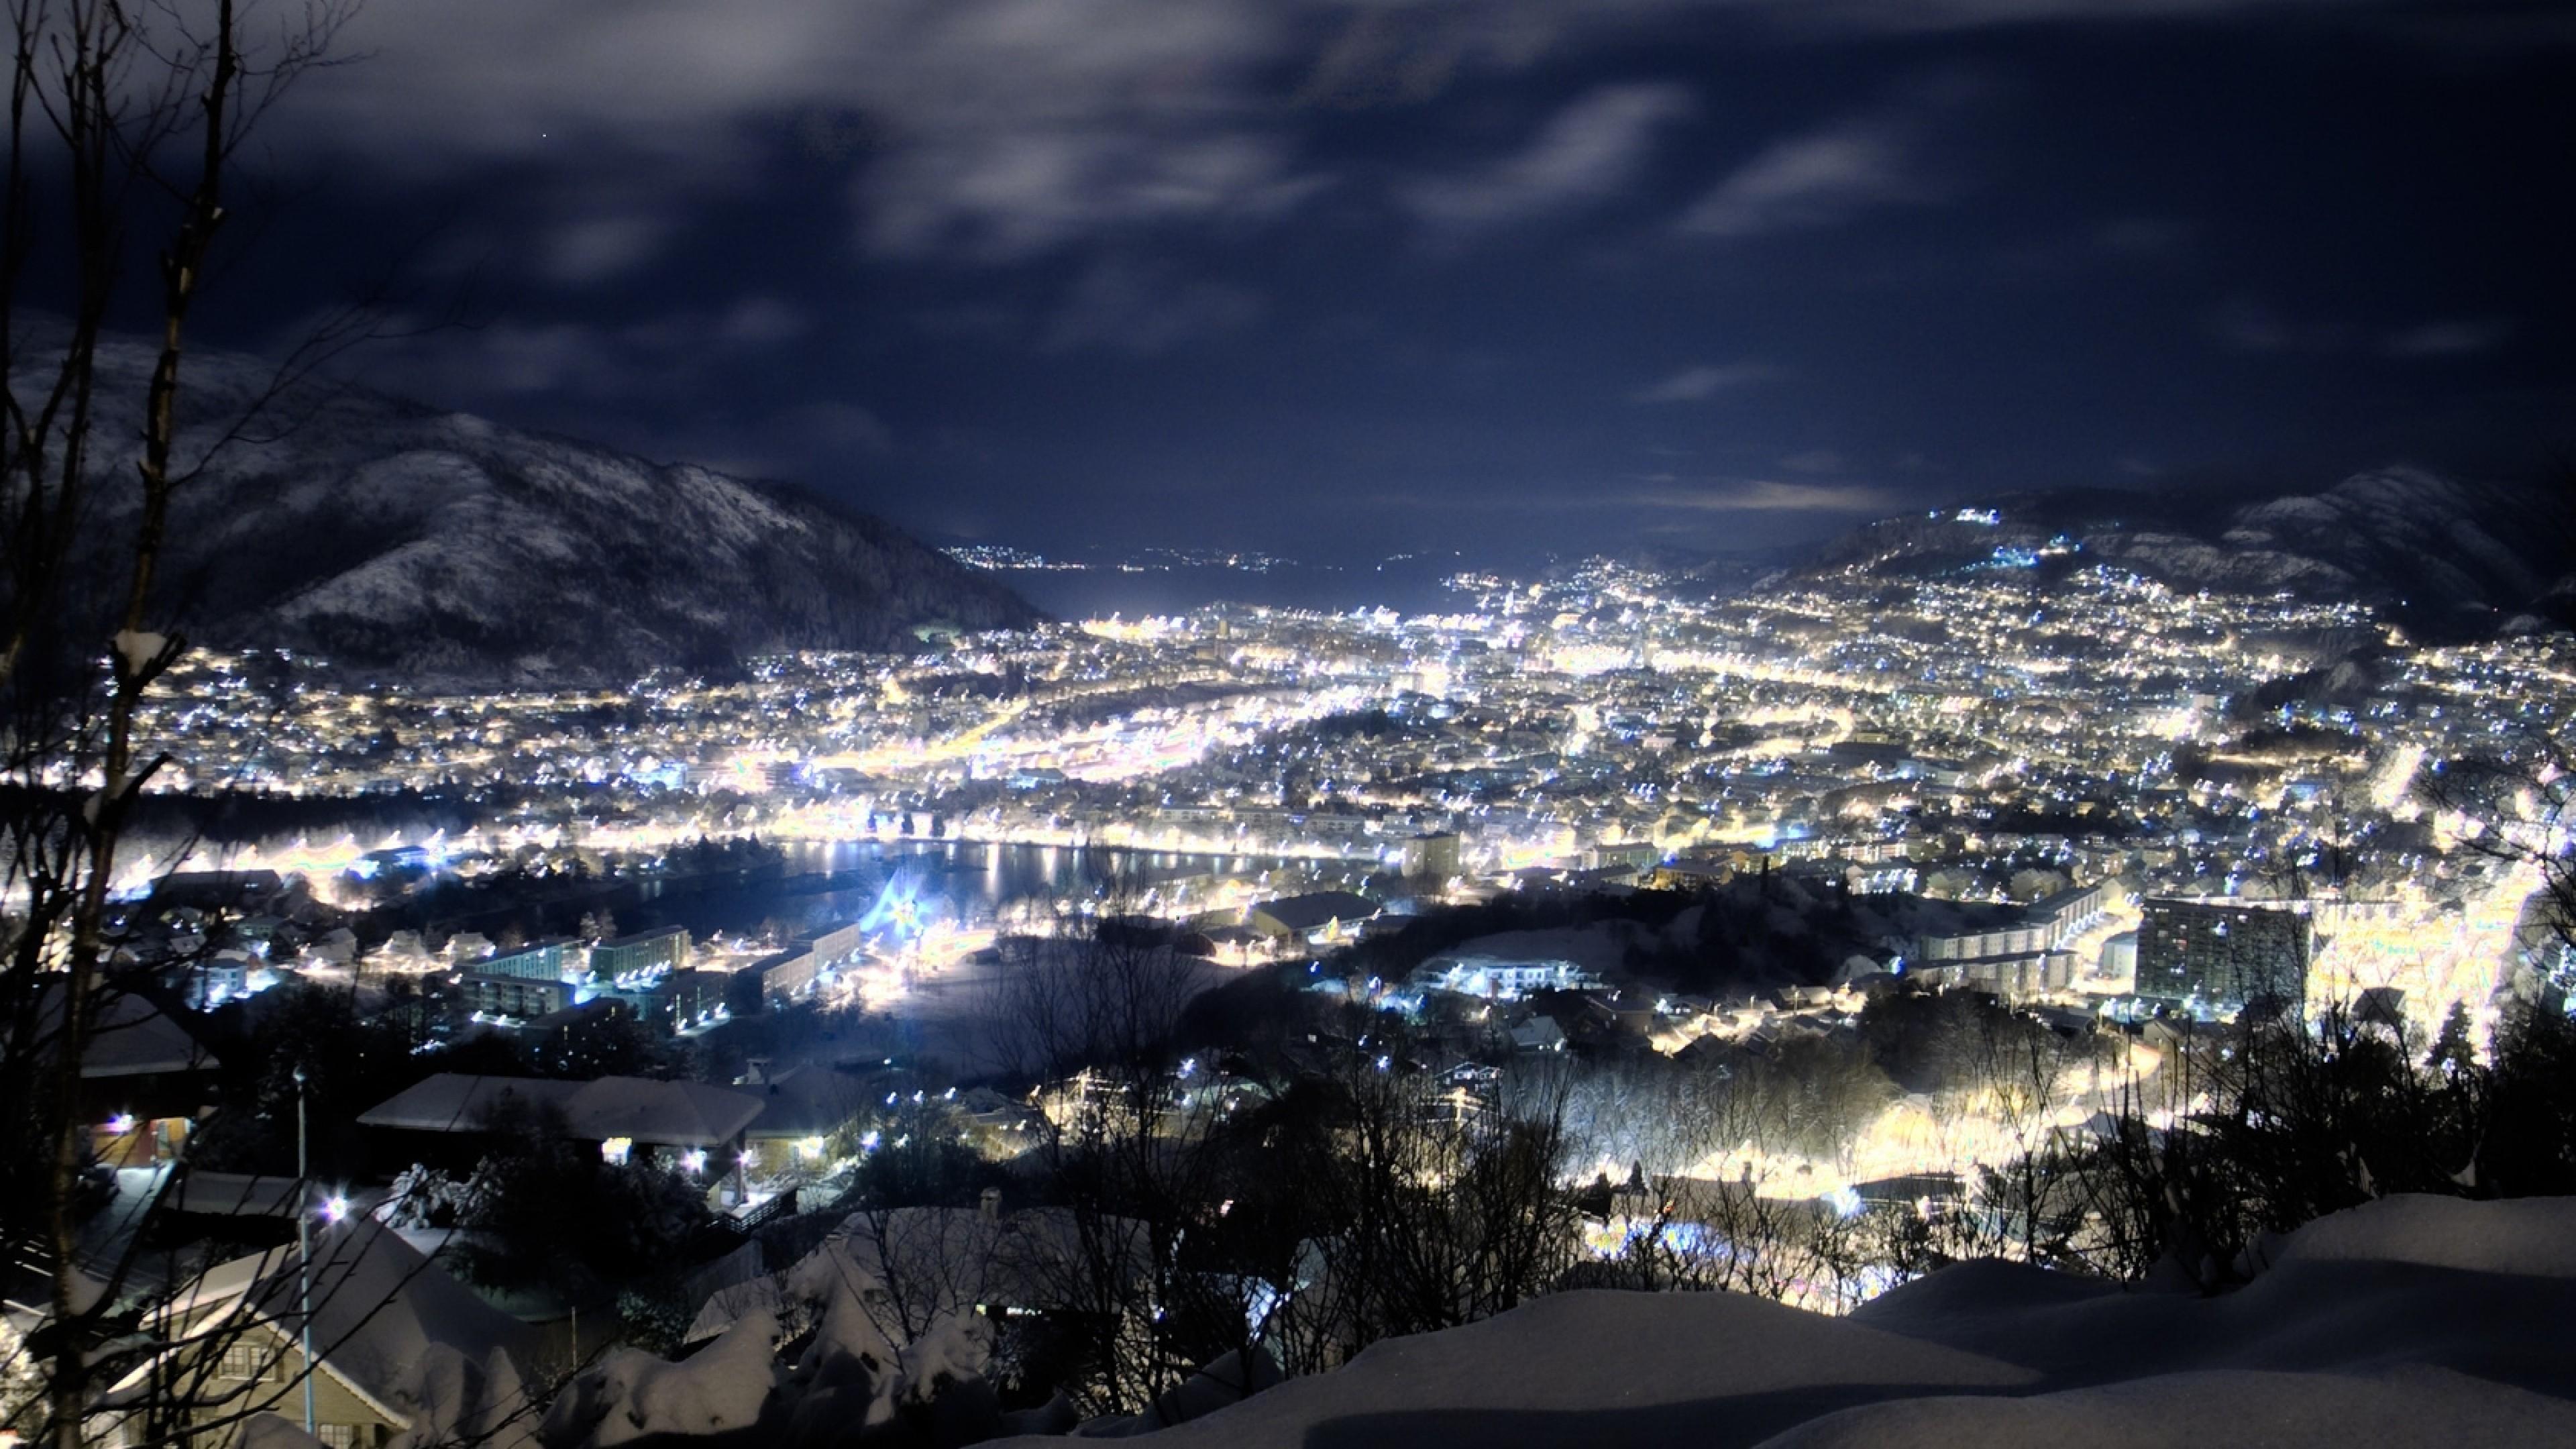 Wallpaper night, snow, height, city, winter